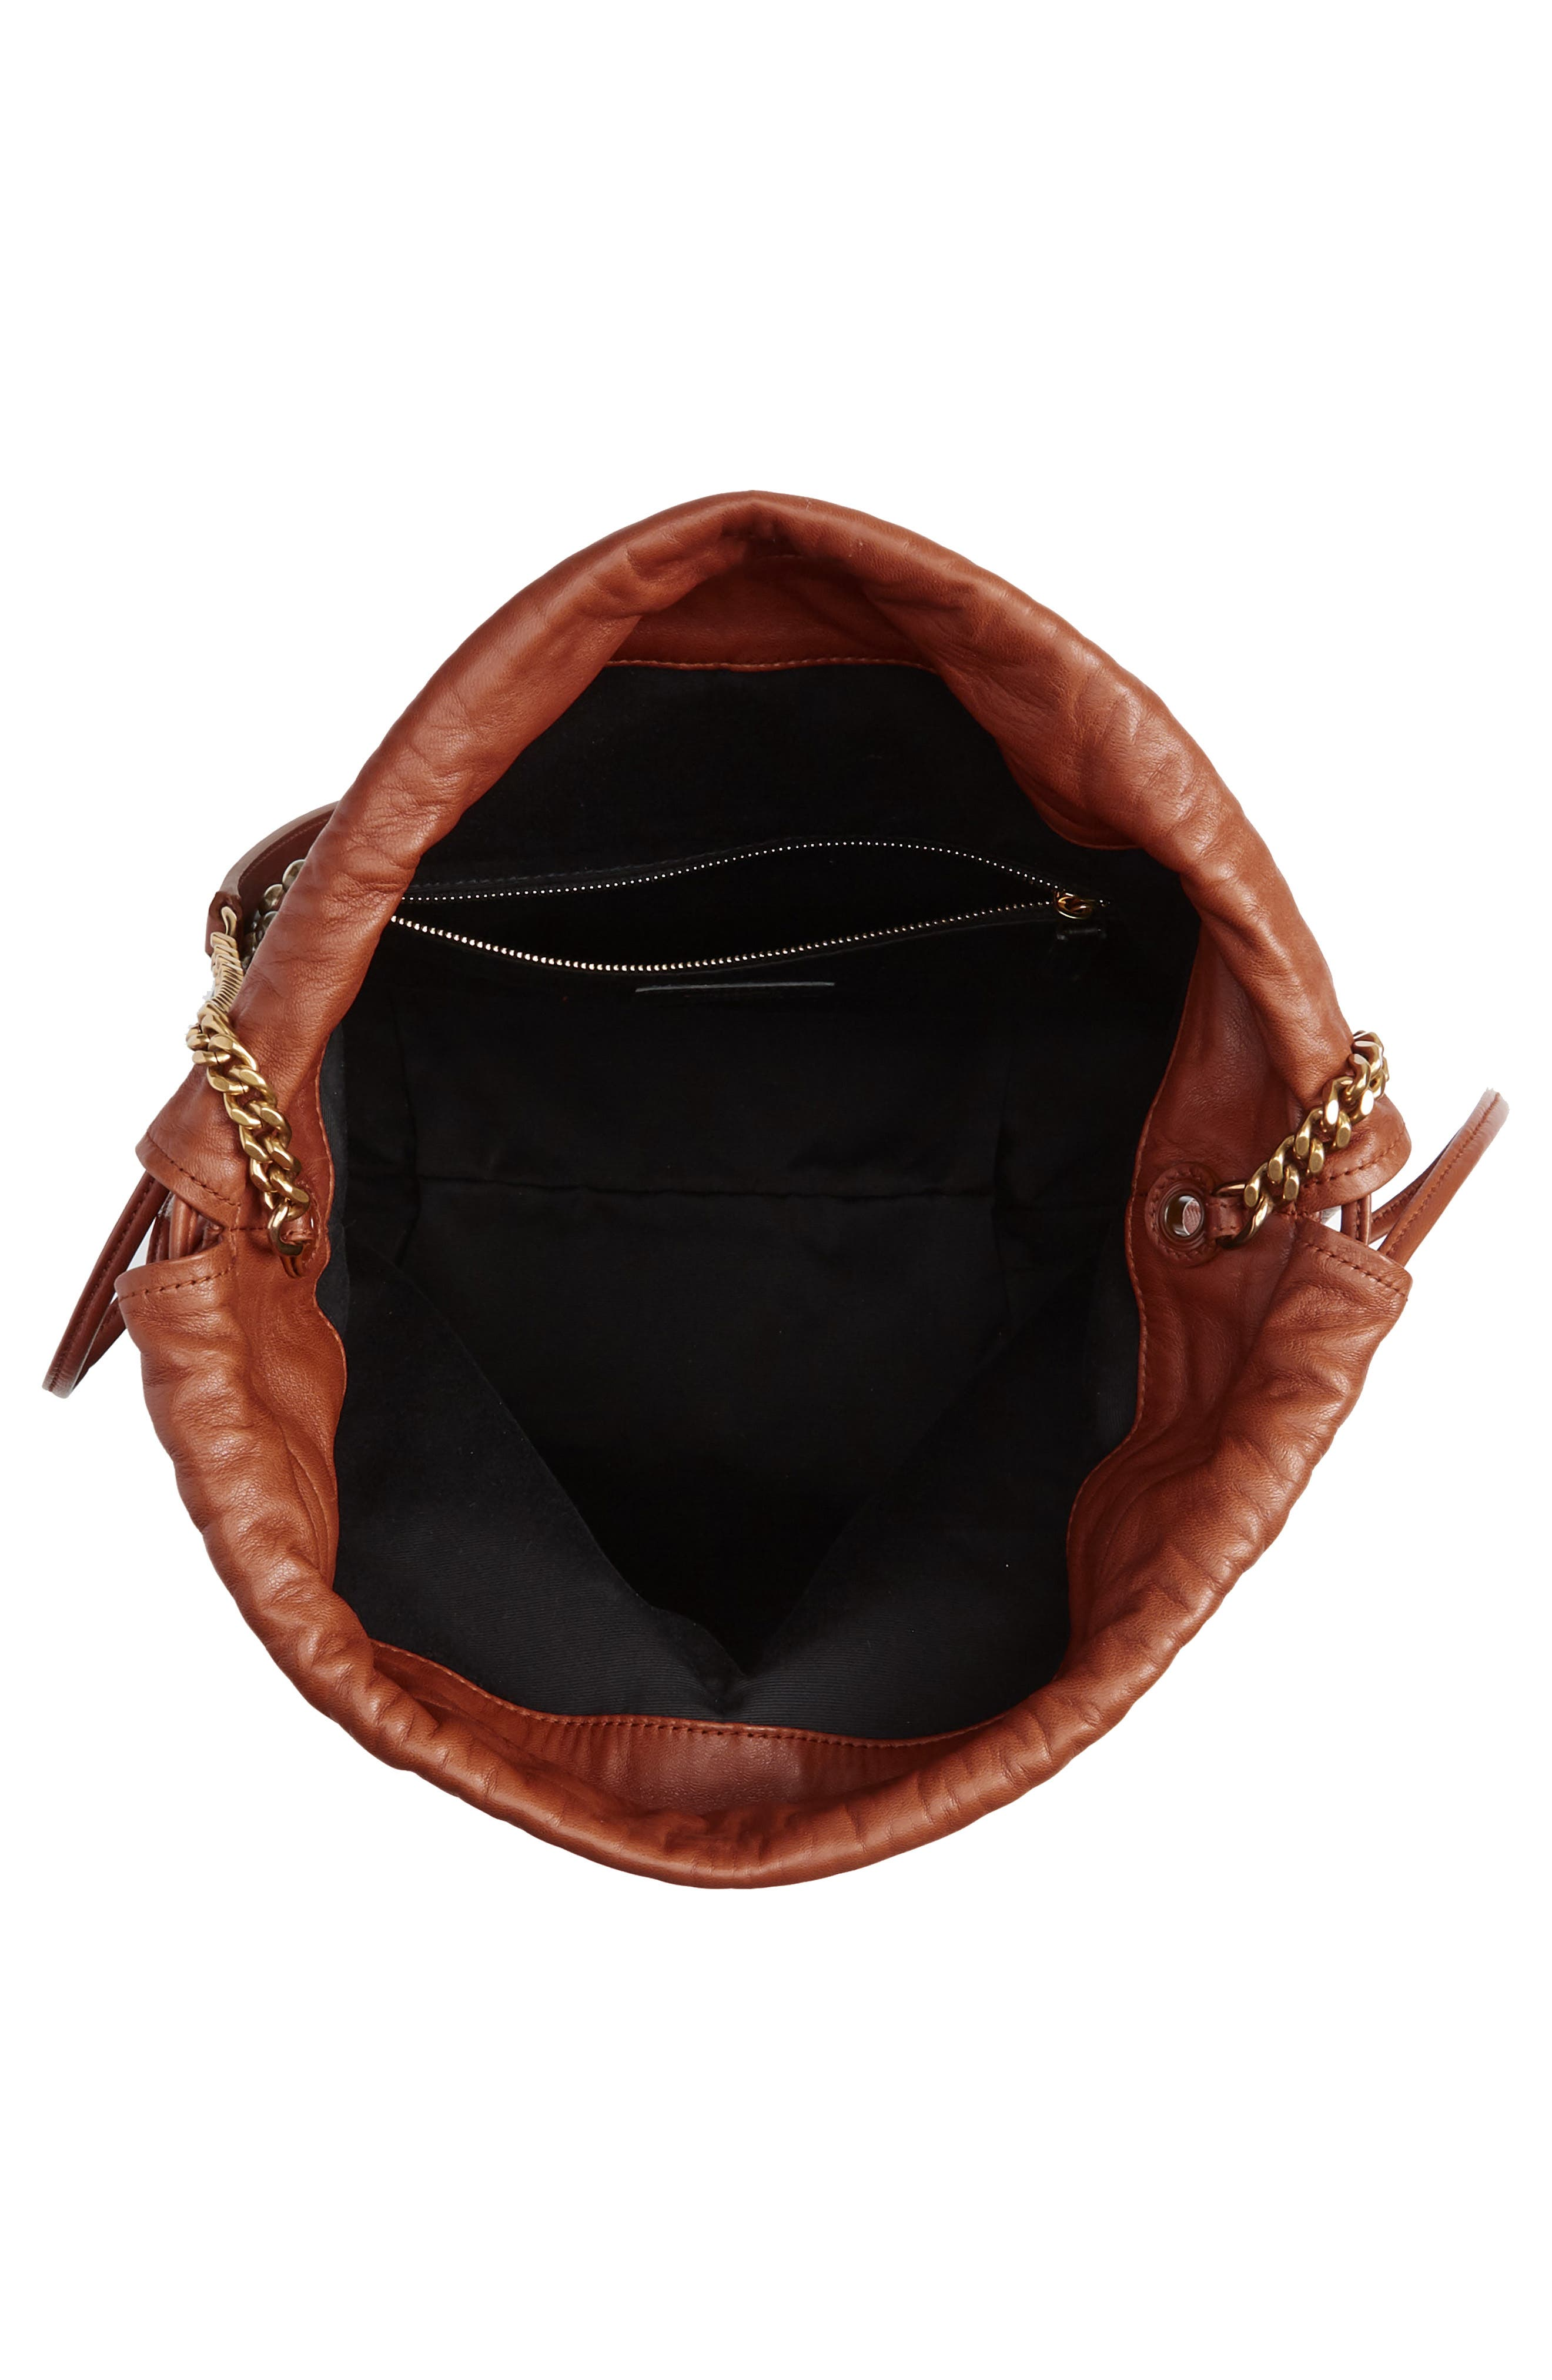 SAINT LAURENT, Teddy Studded Leather Bucket Bag, Alternate thumbnail 4, color, 200